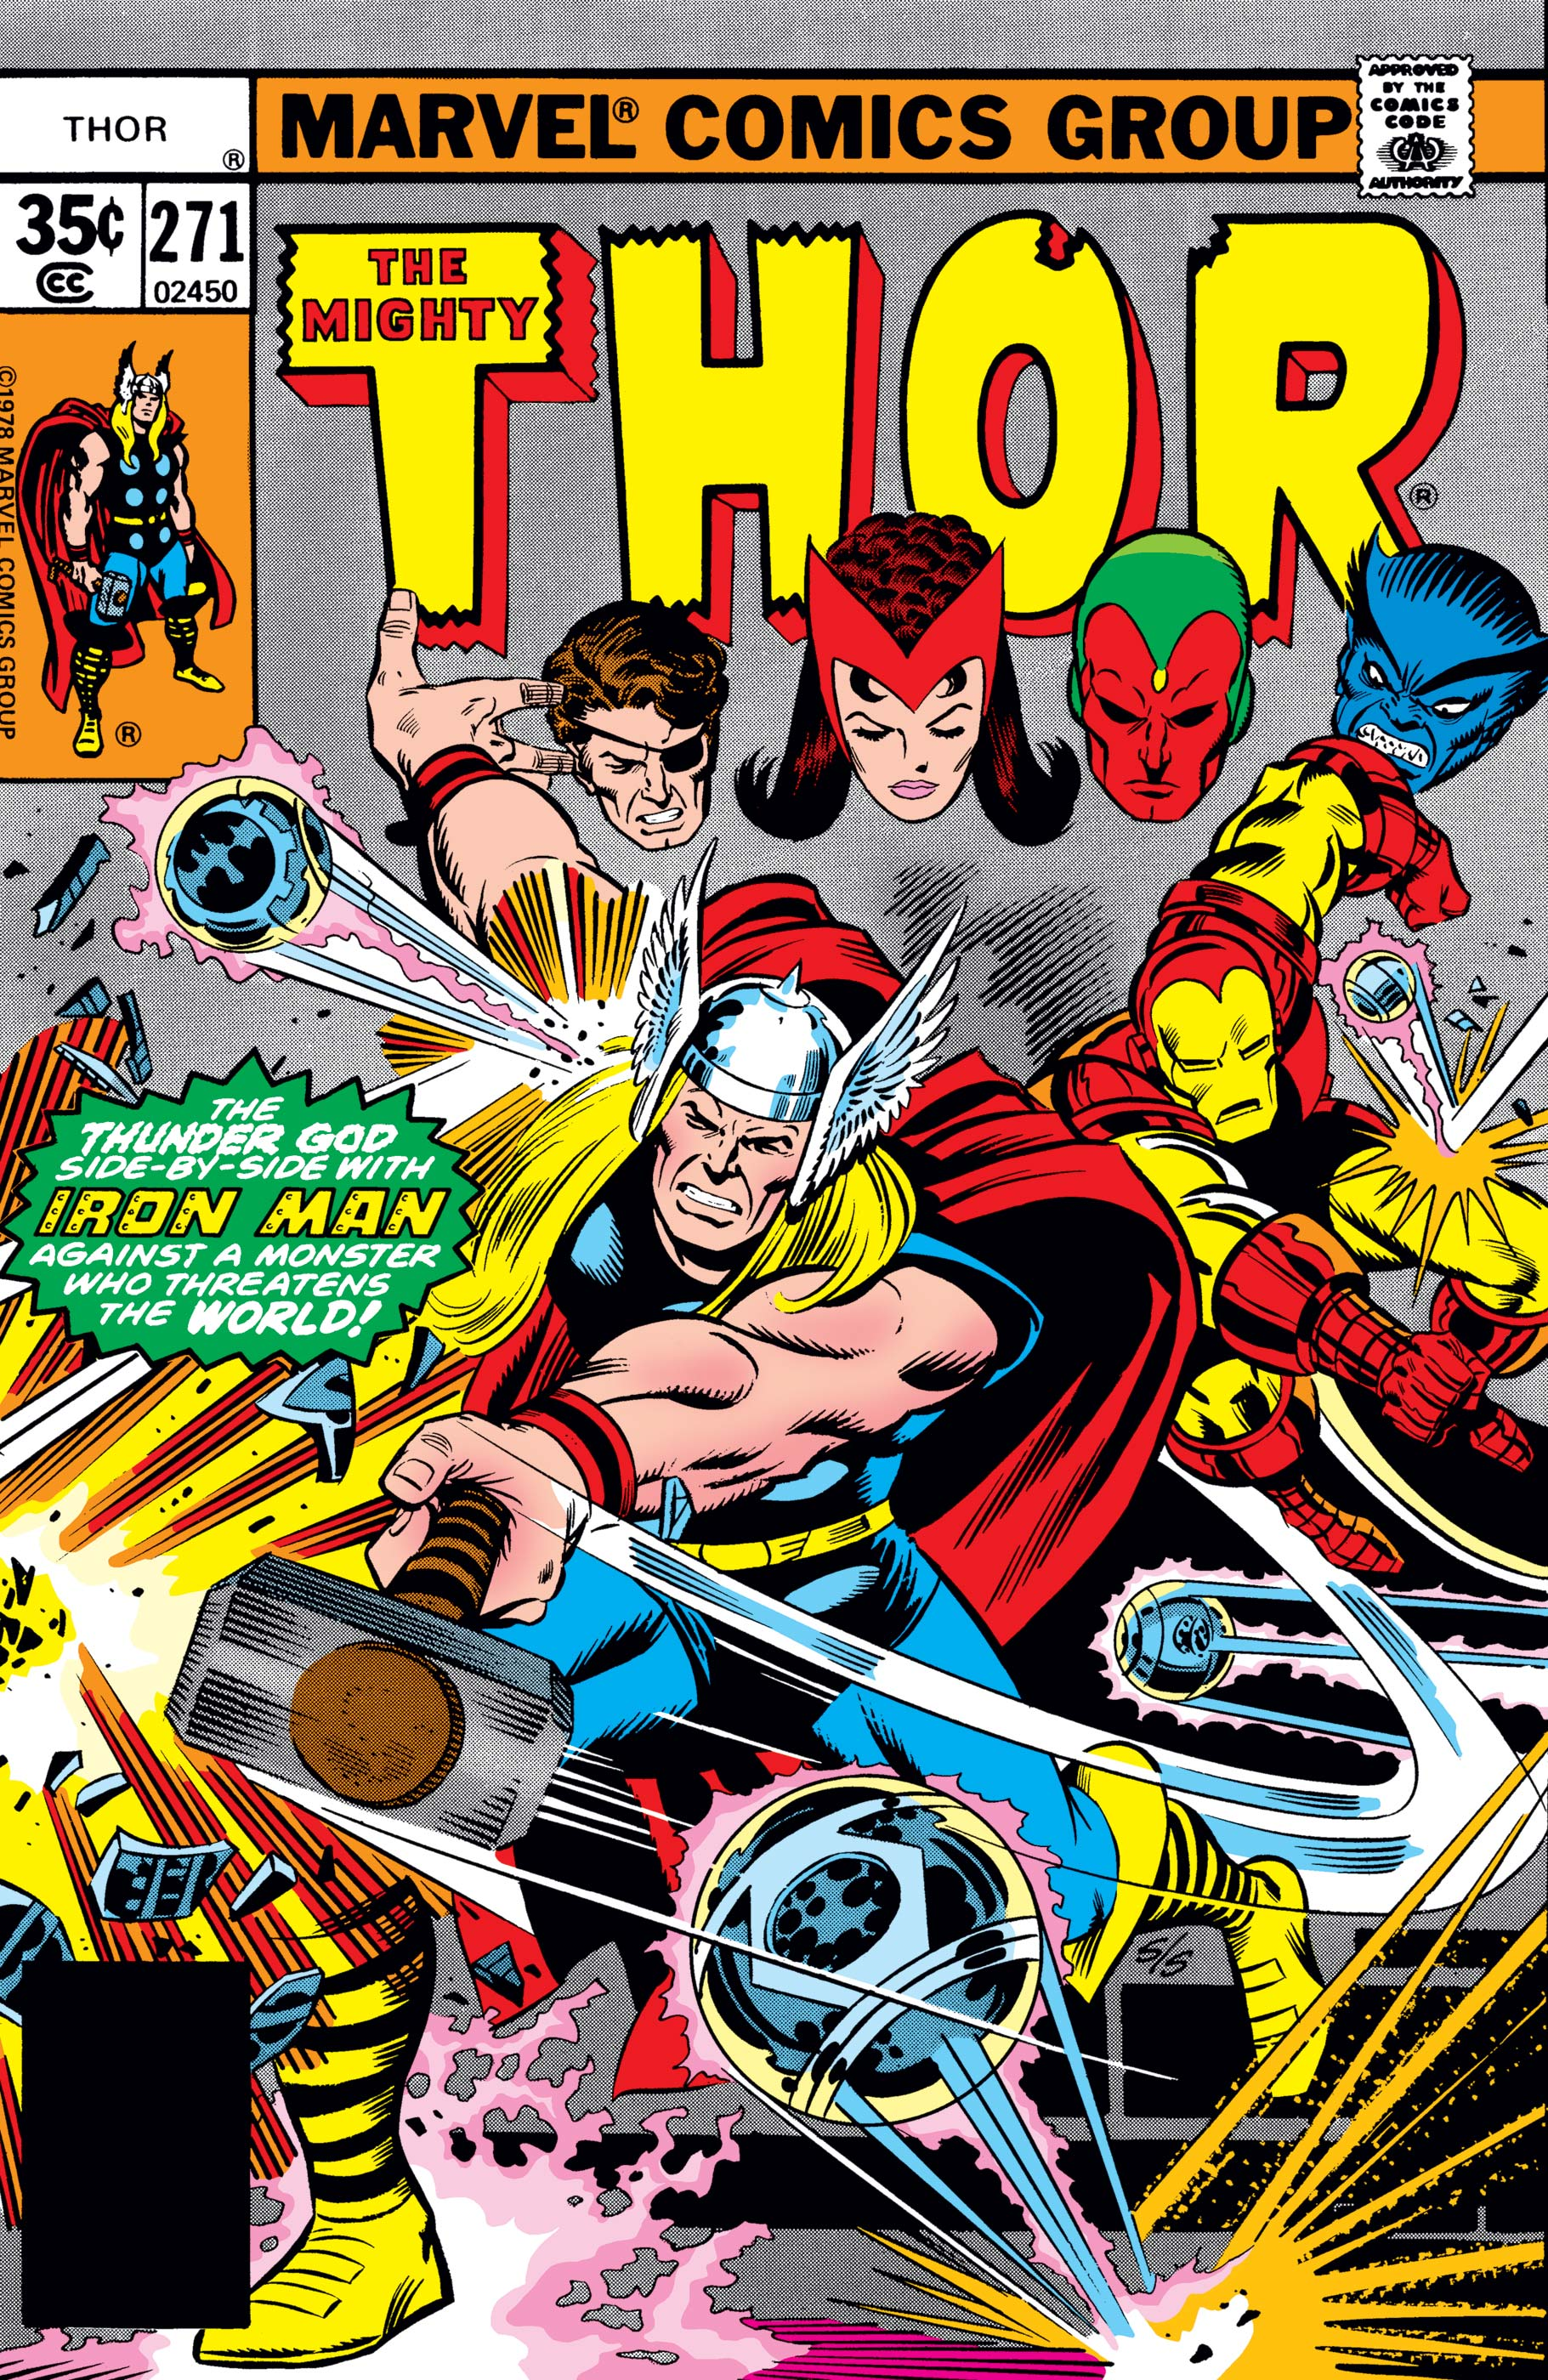 Thor (1966) #271